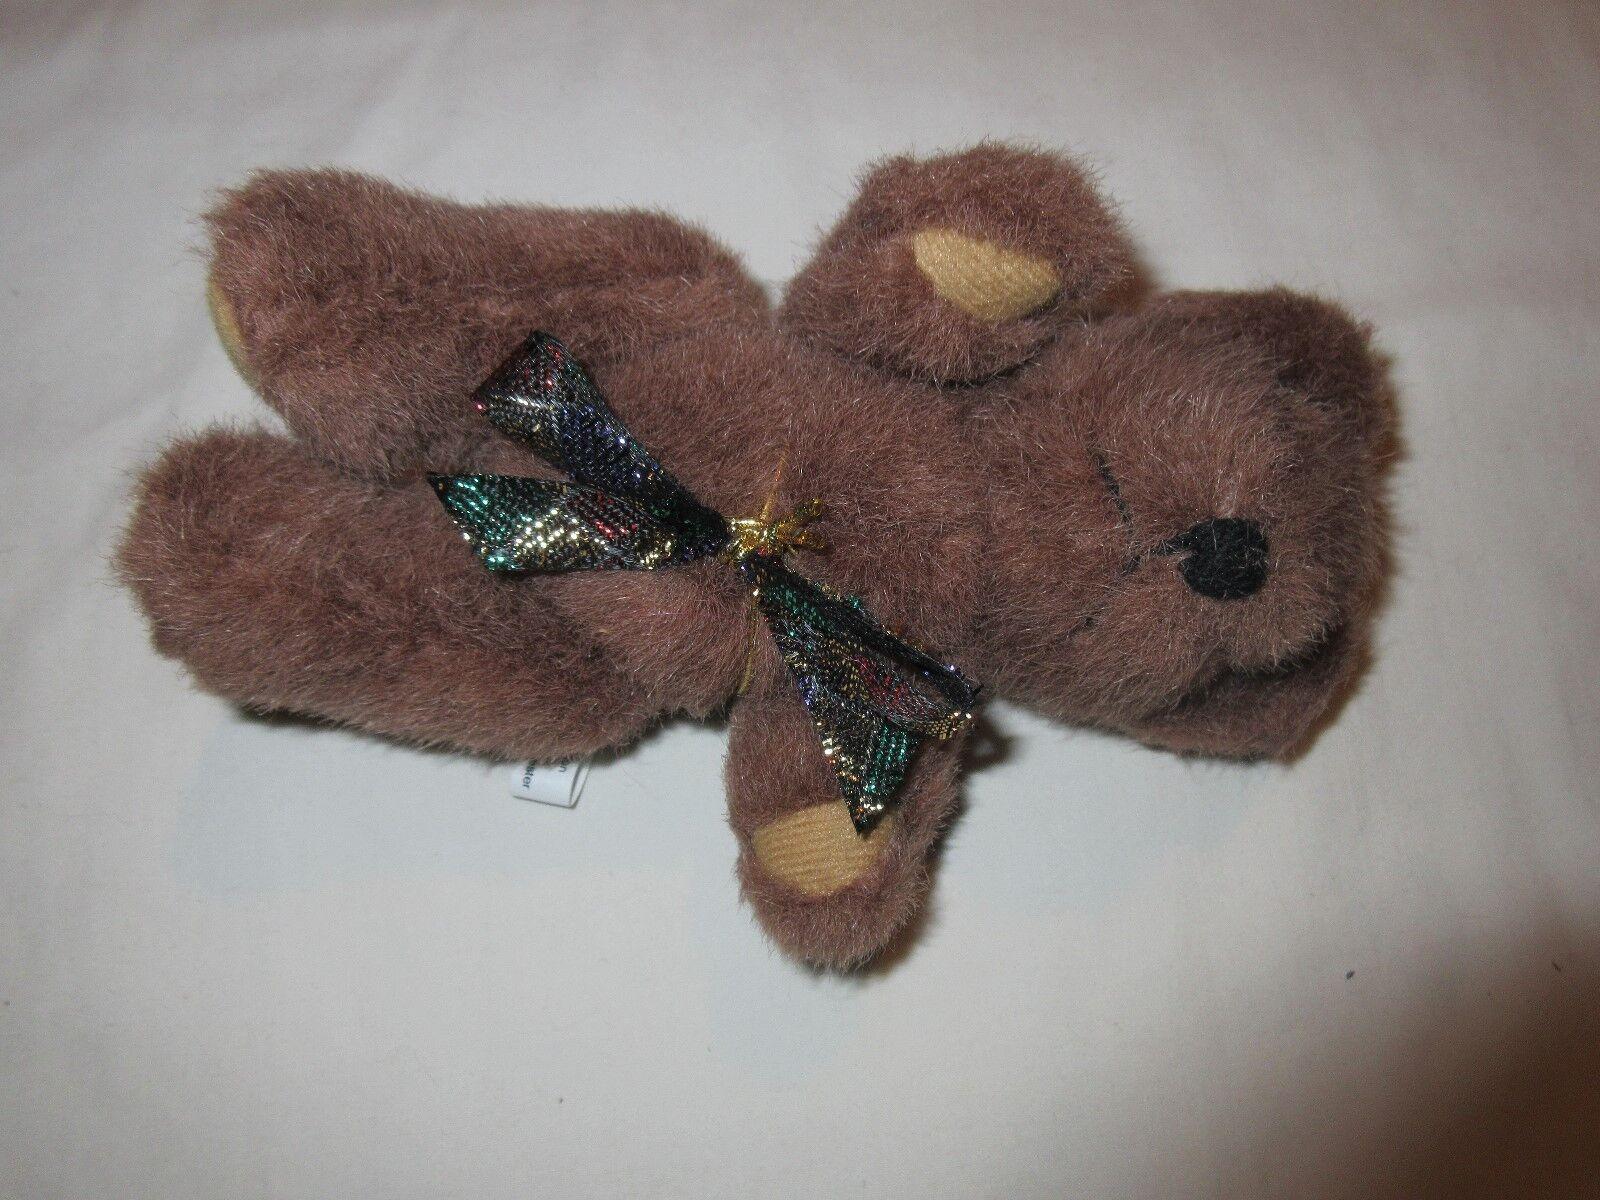 Christmas Decoration, Minitature Stuffed Bear With Holi